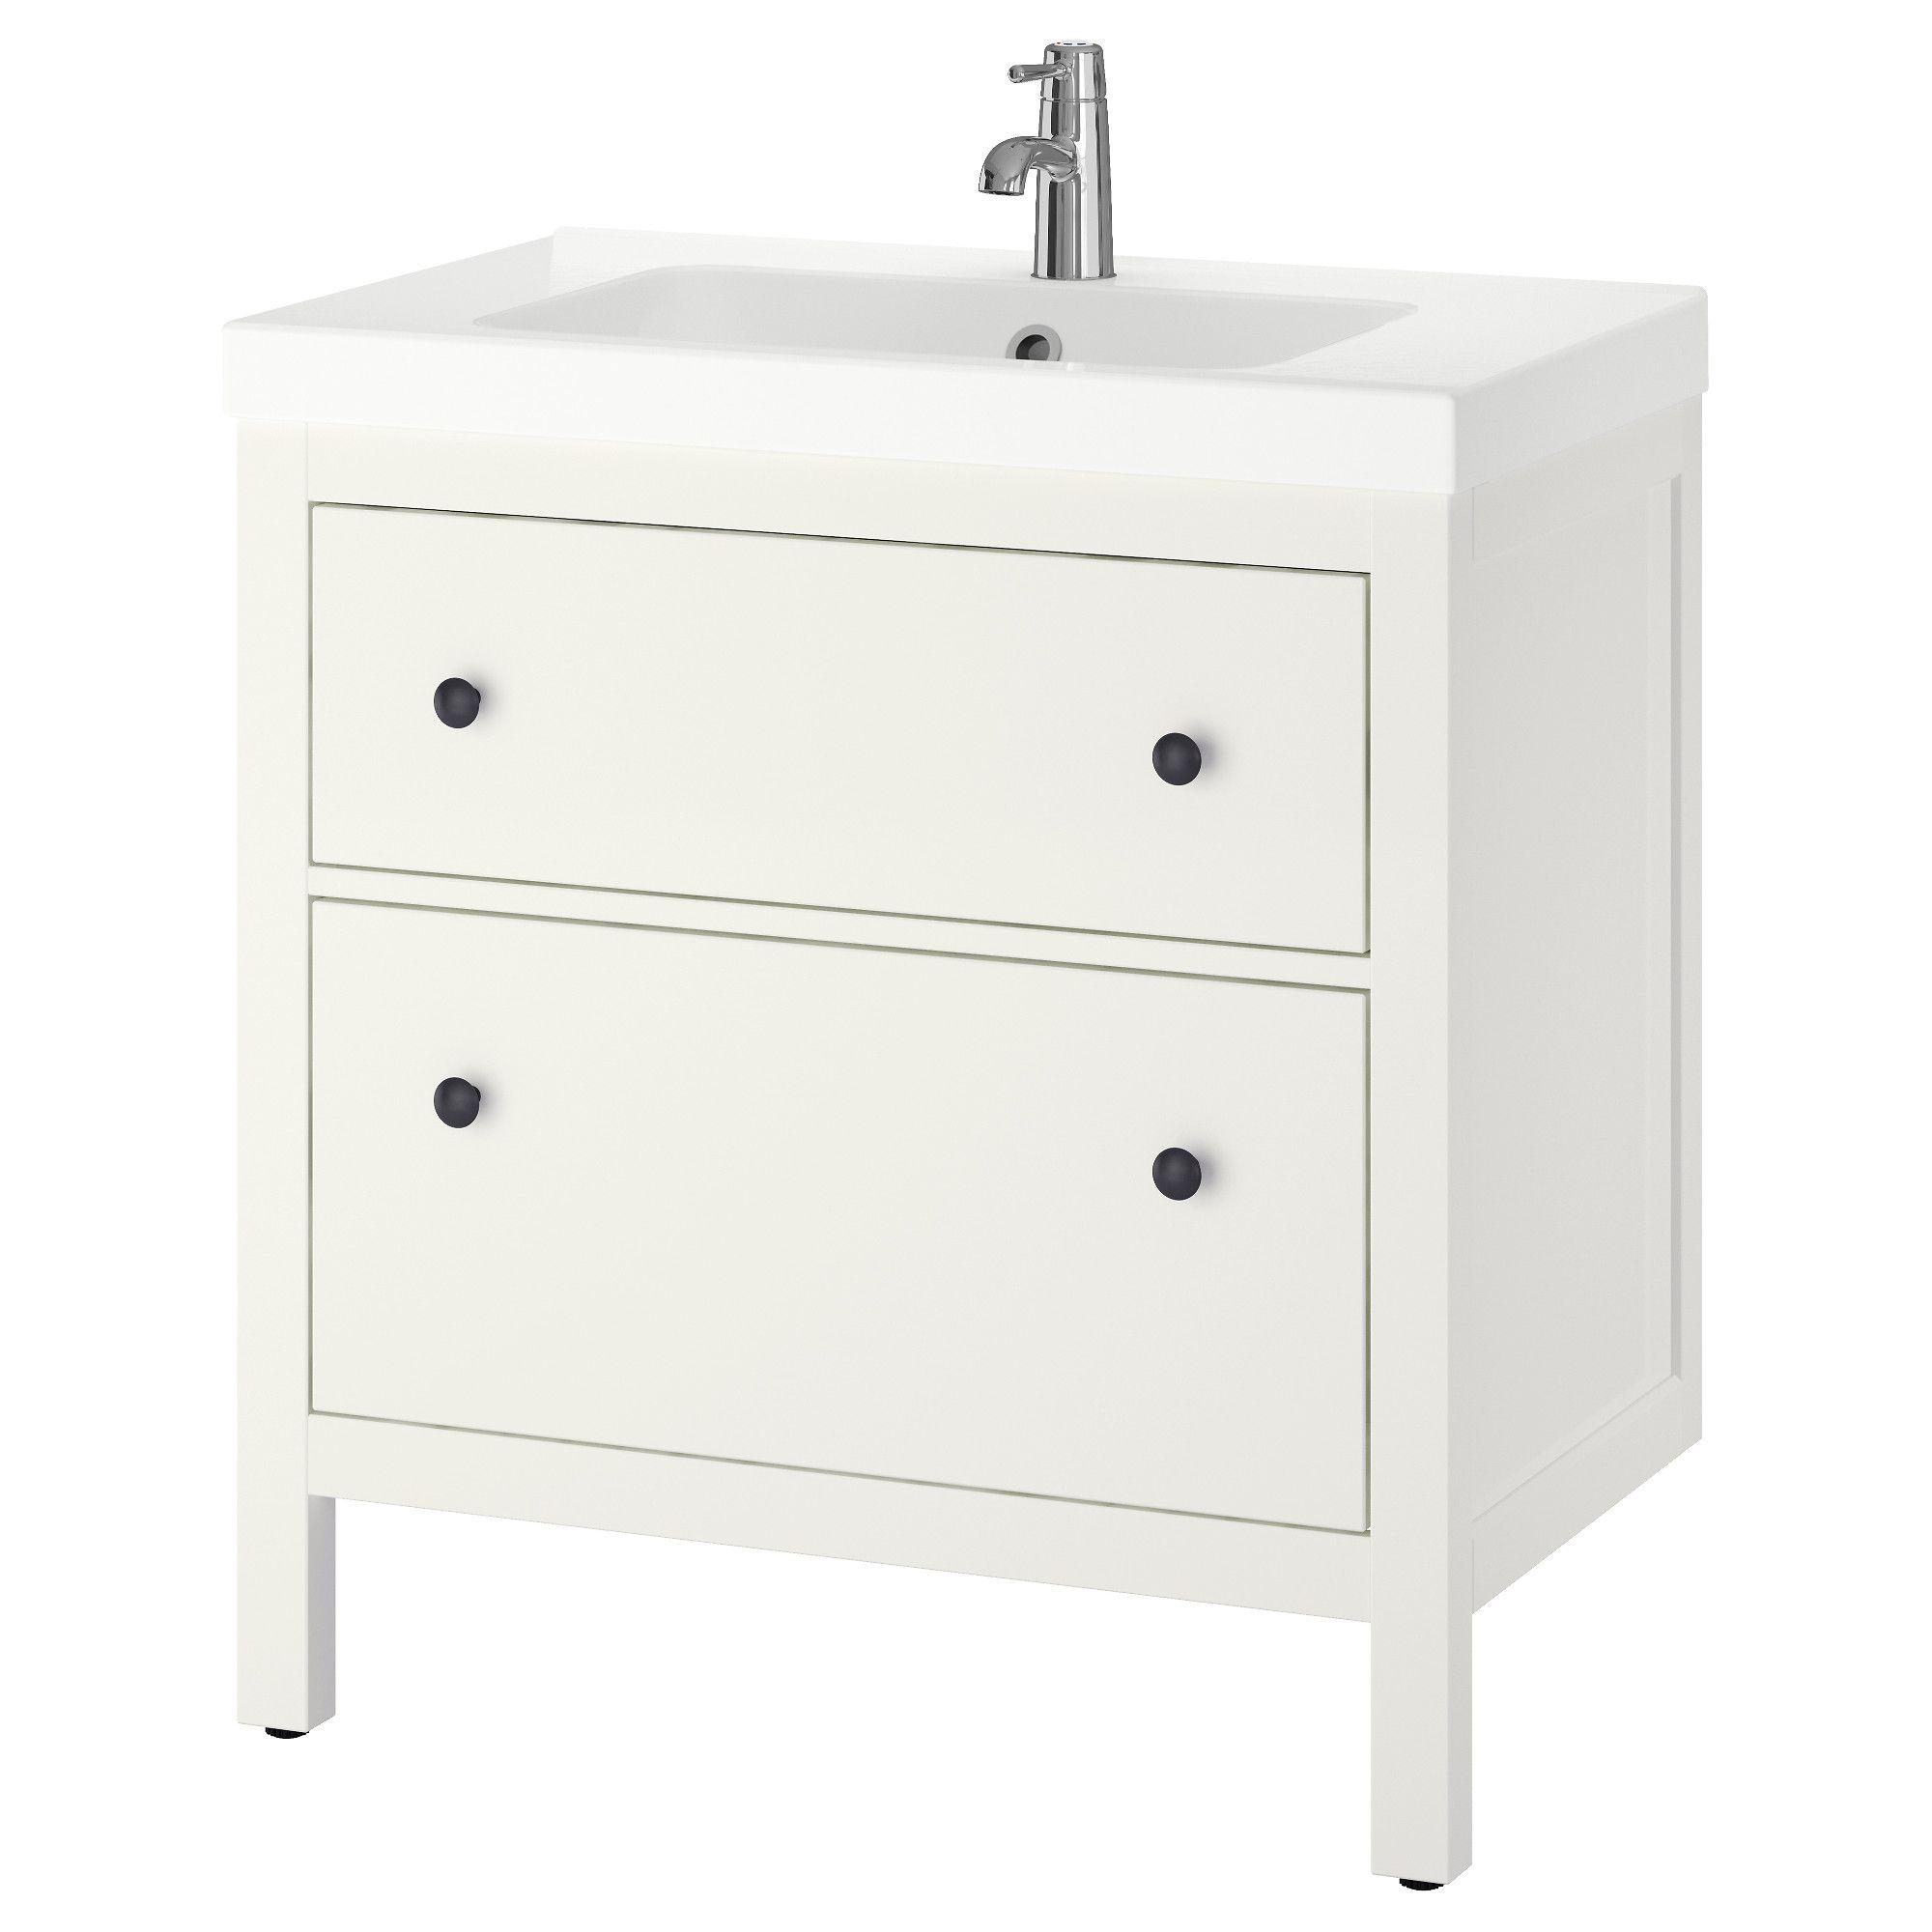 Ikea Us Furniture And Home Furnishings Bathroom Sink Cabinets Sink Cabinet Hemnes